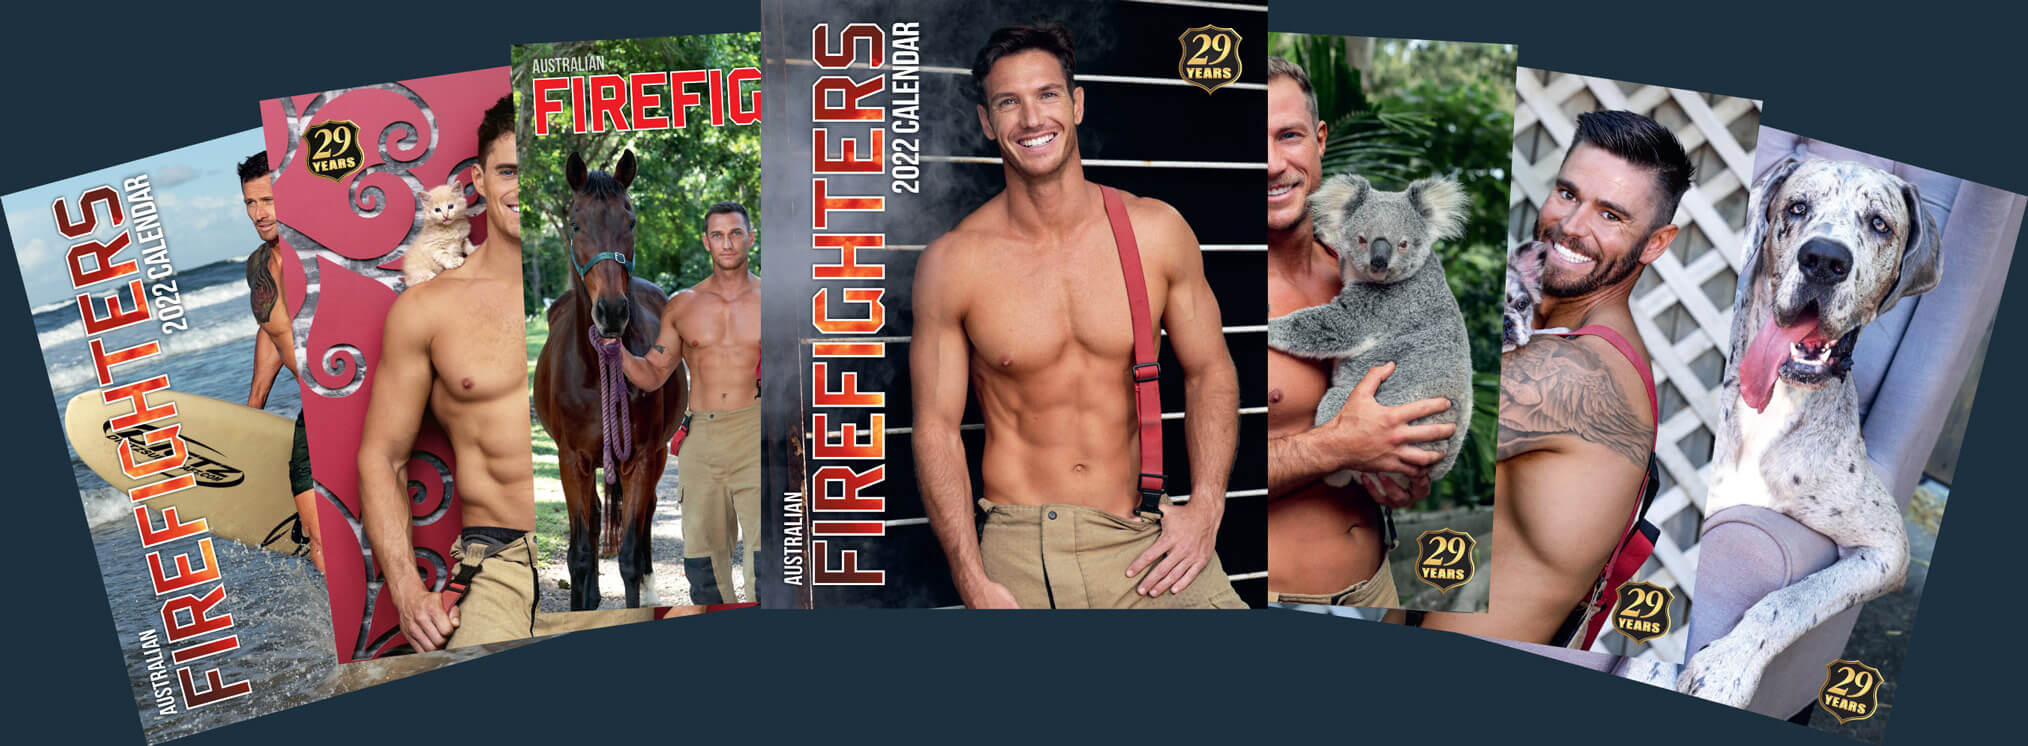 Australian Firefighters 2022 Calendars